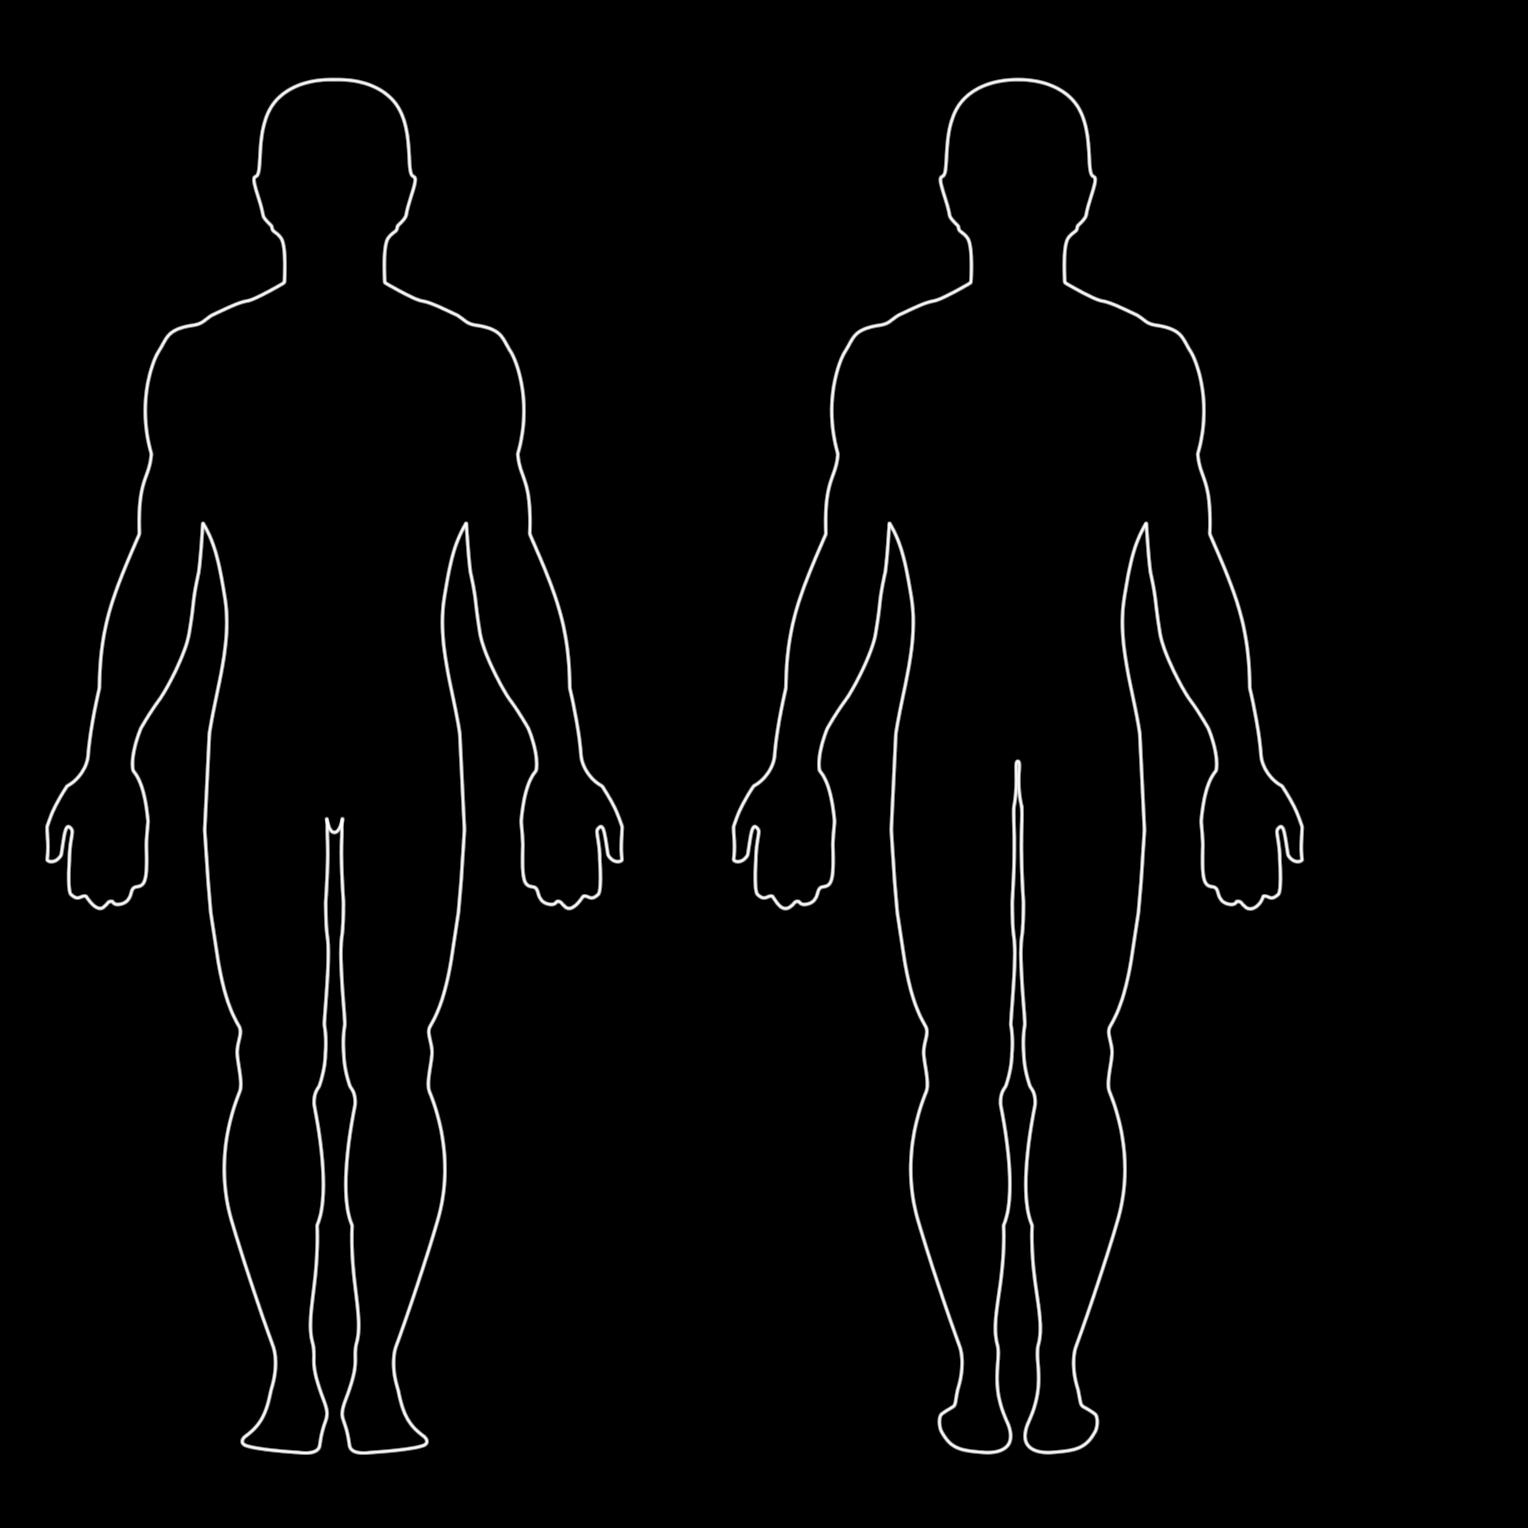 Colon, Rectum and Anus: Anatomic, Physiologic and Diagnostic